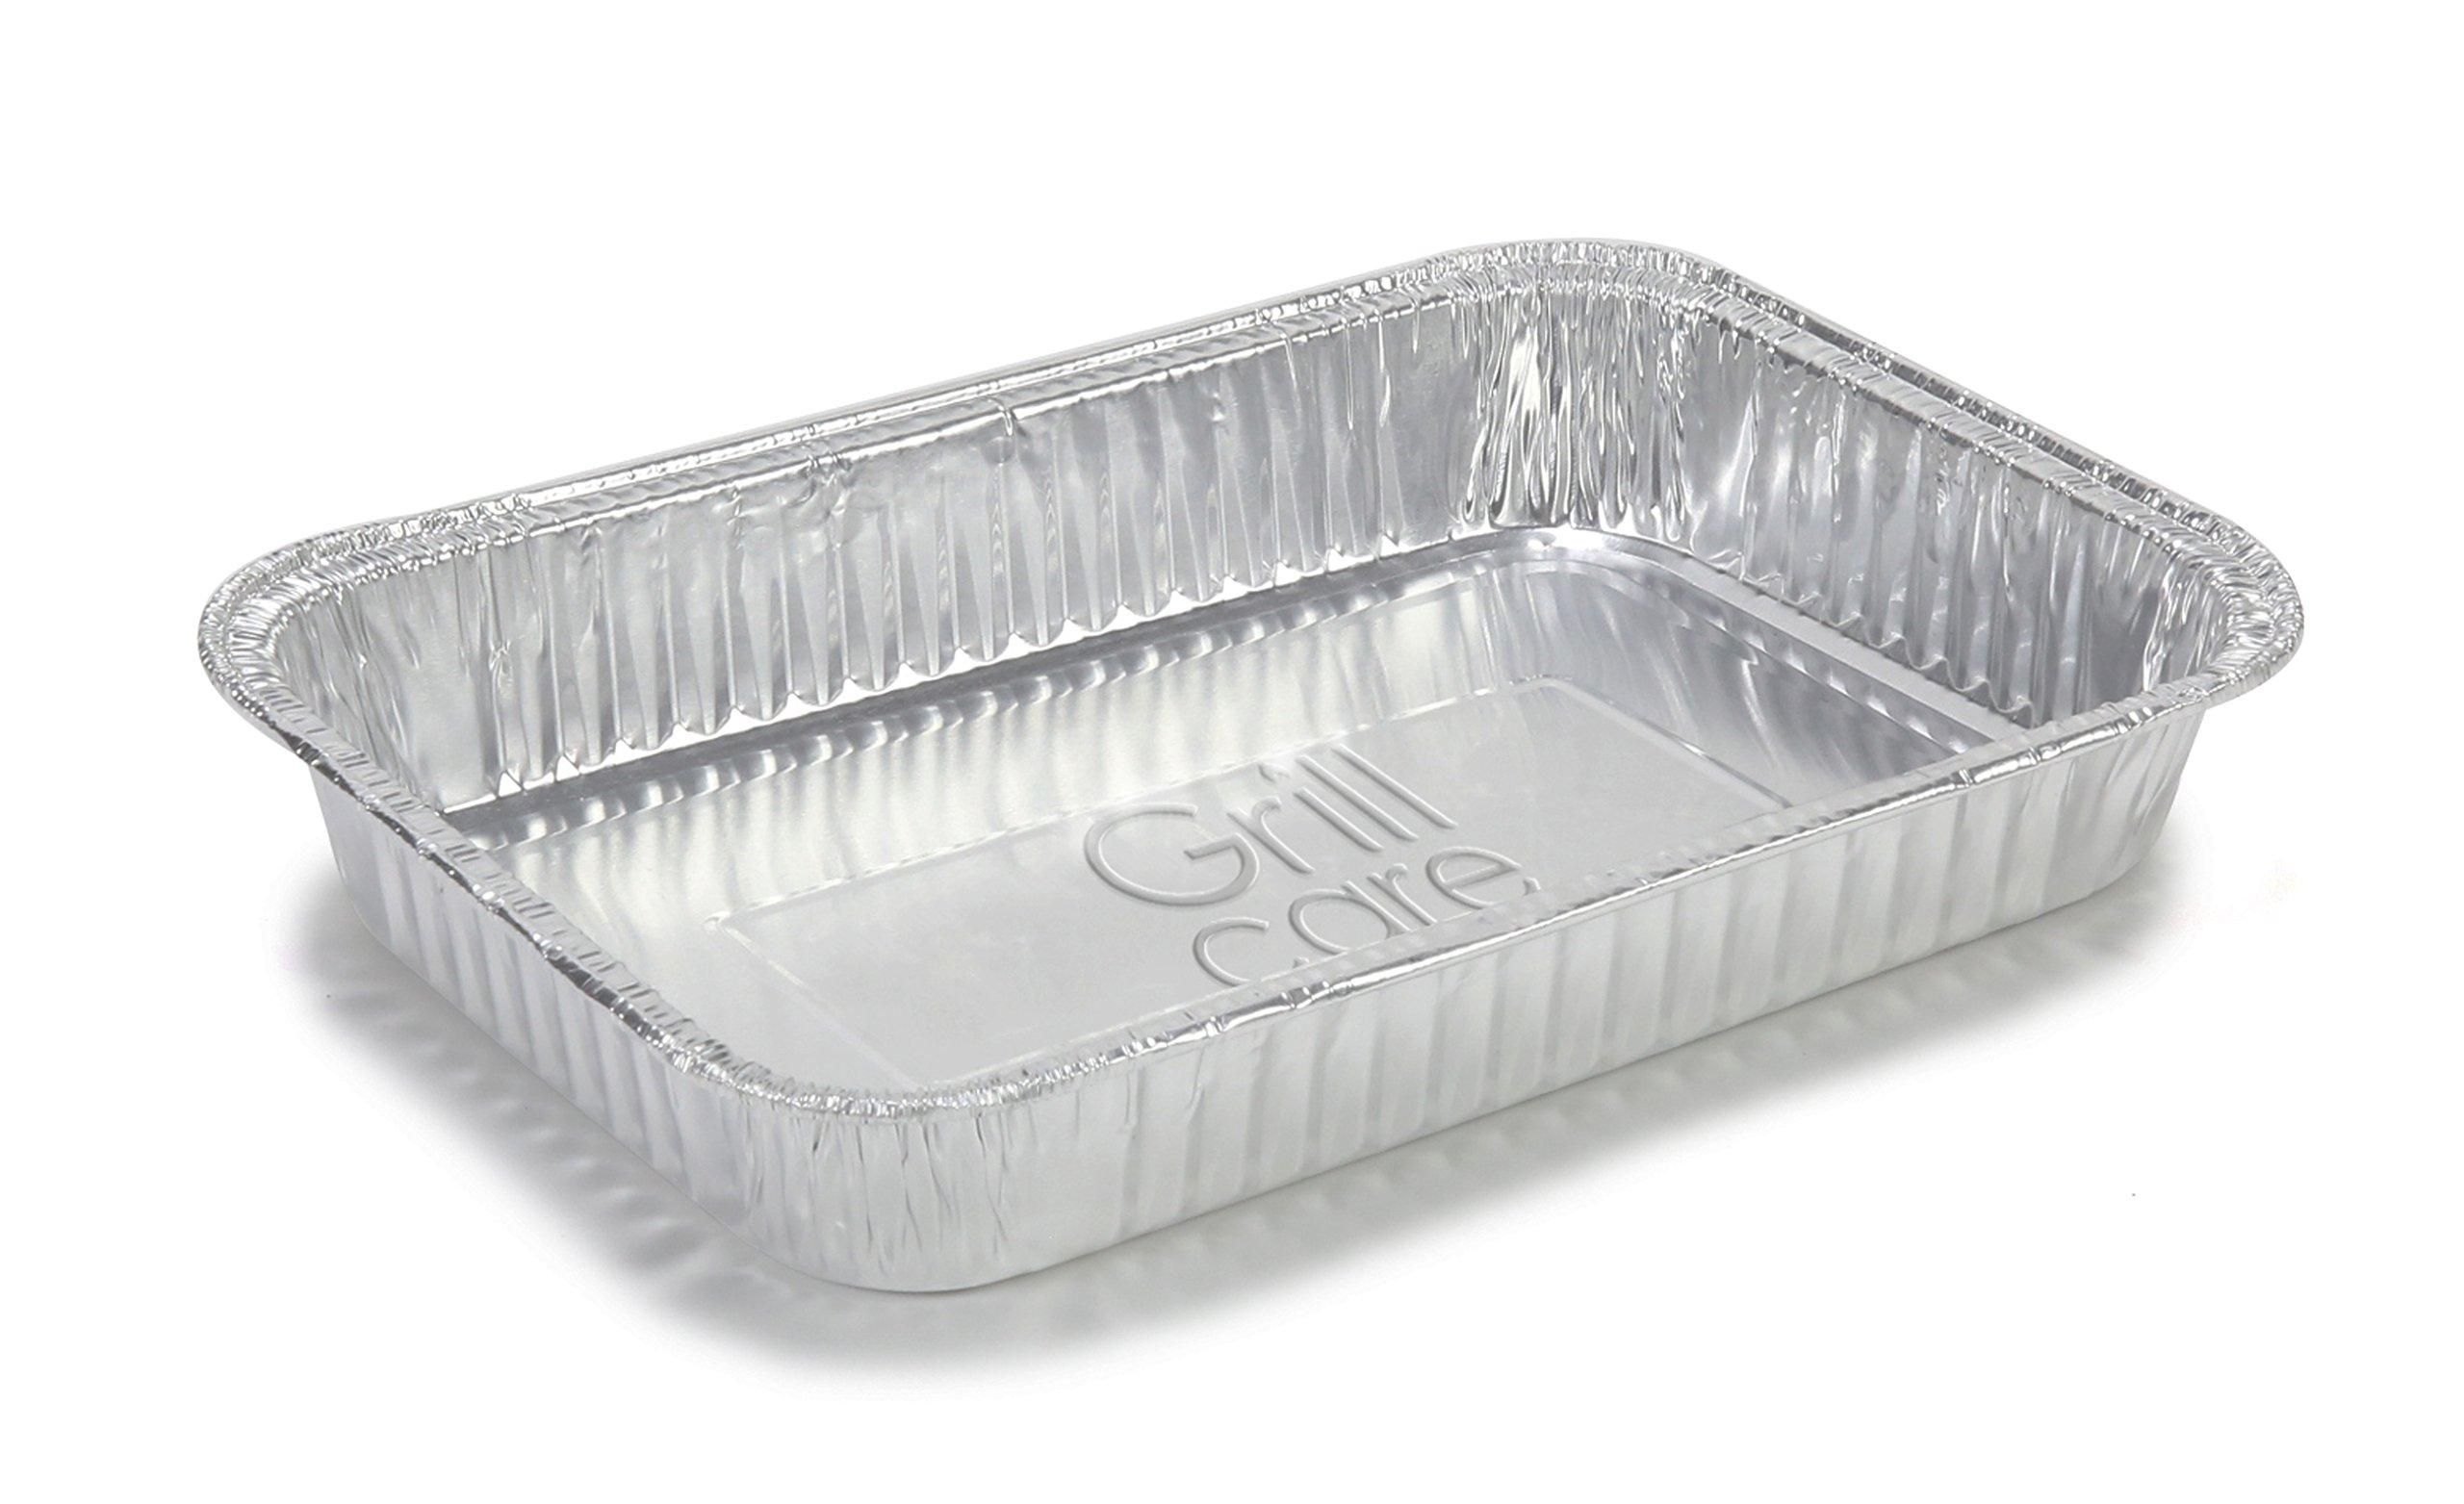 Grill Care 16415 Foil Drip Pans Compatible With Weber Q